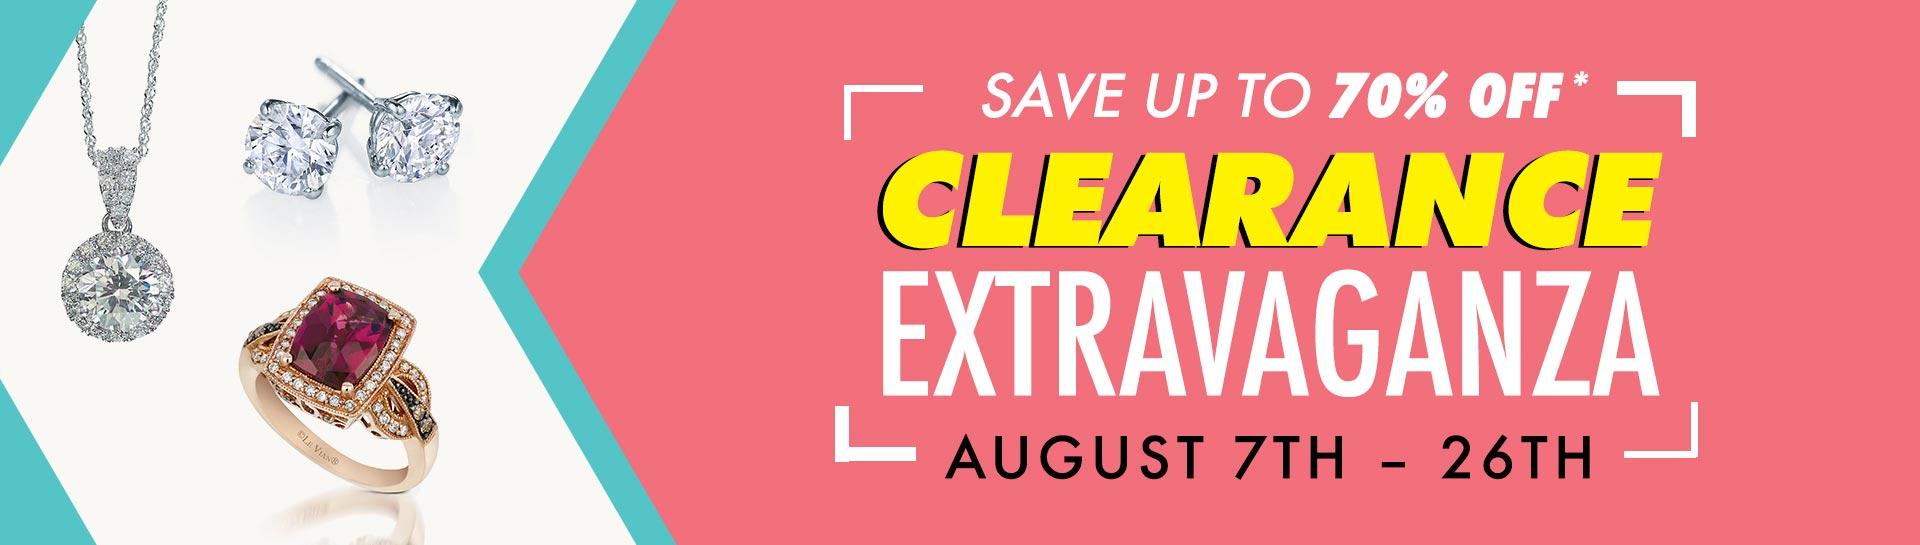 Ben David Clearance Extravaganza!